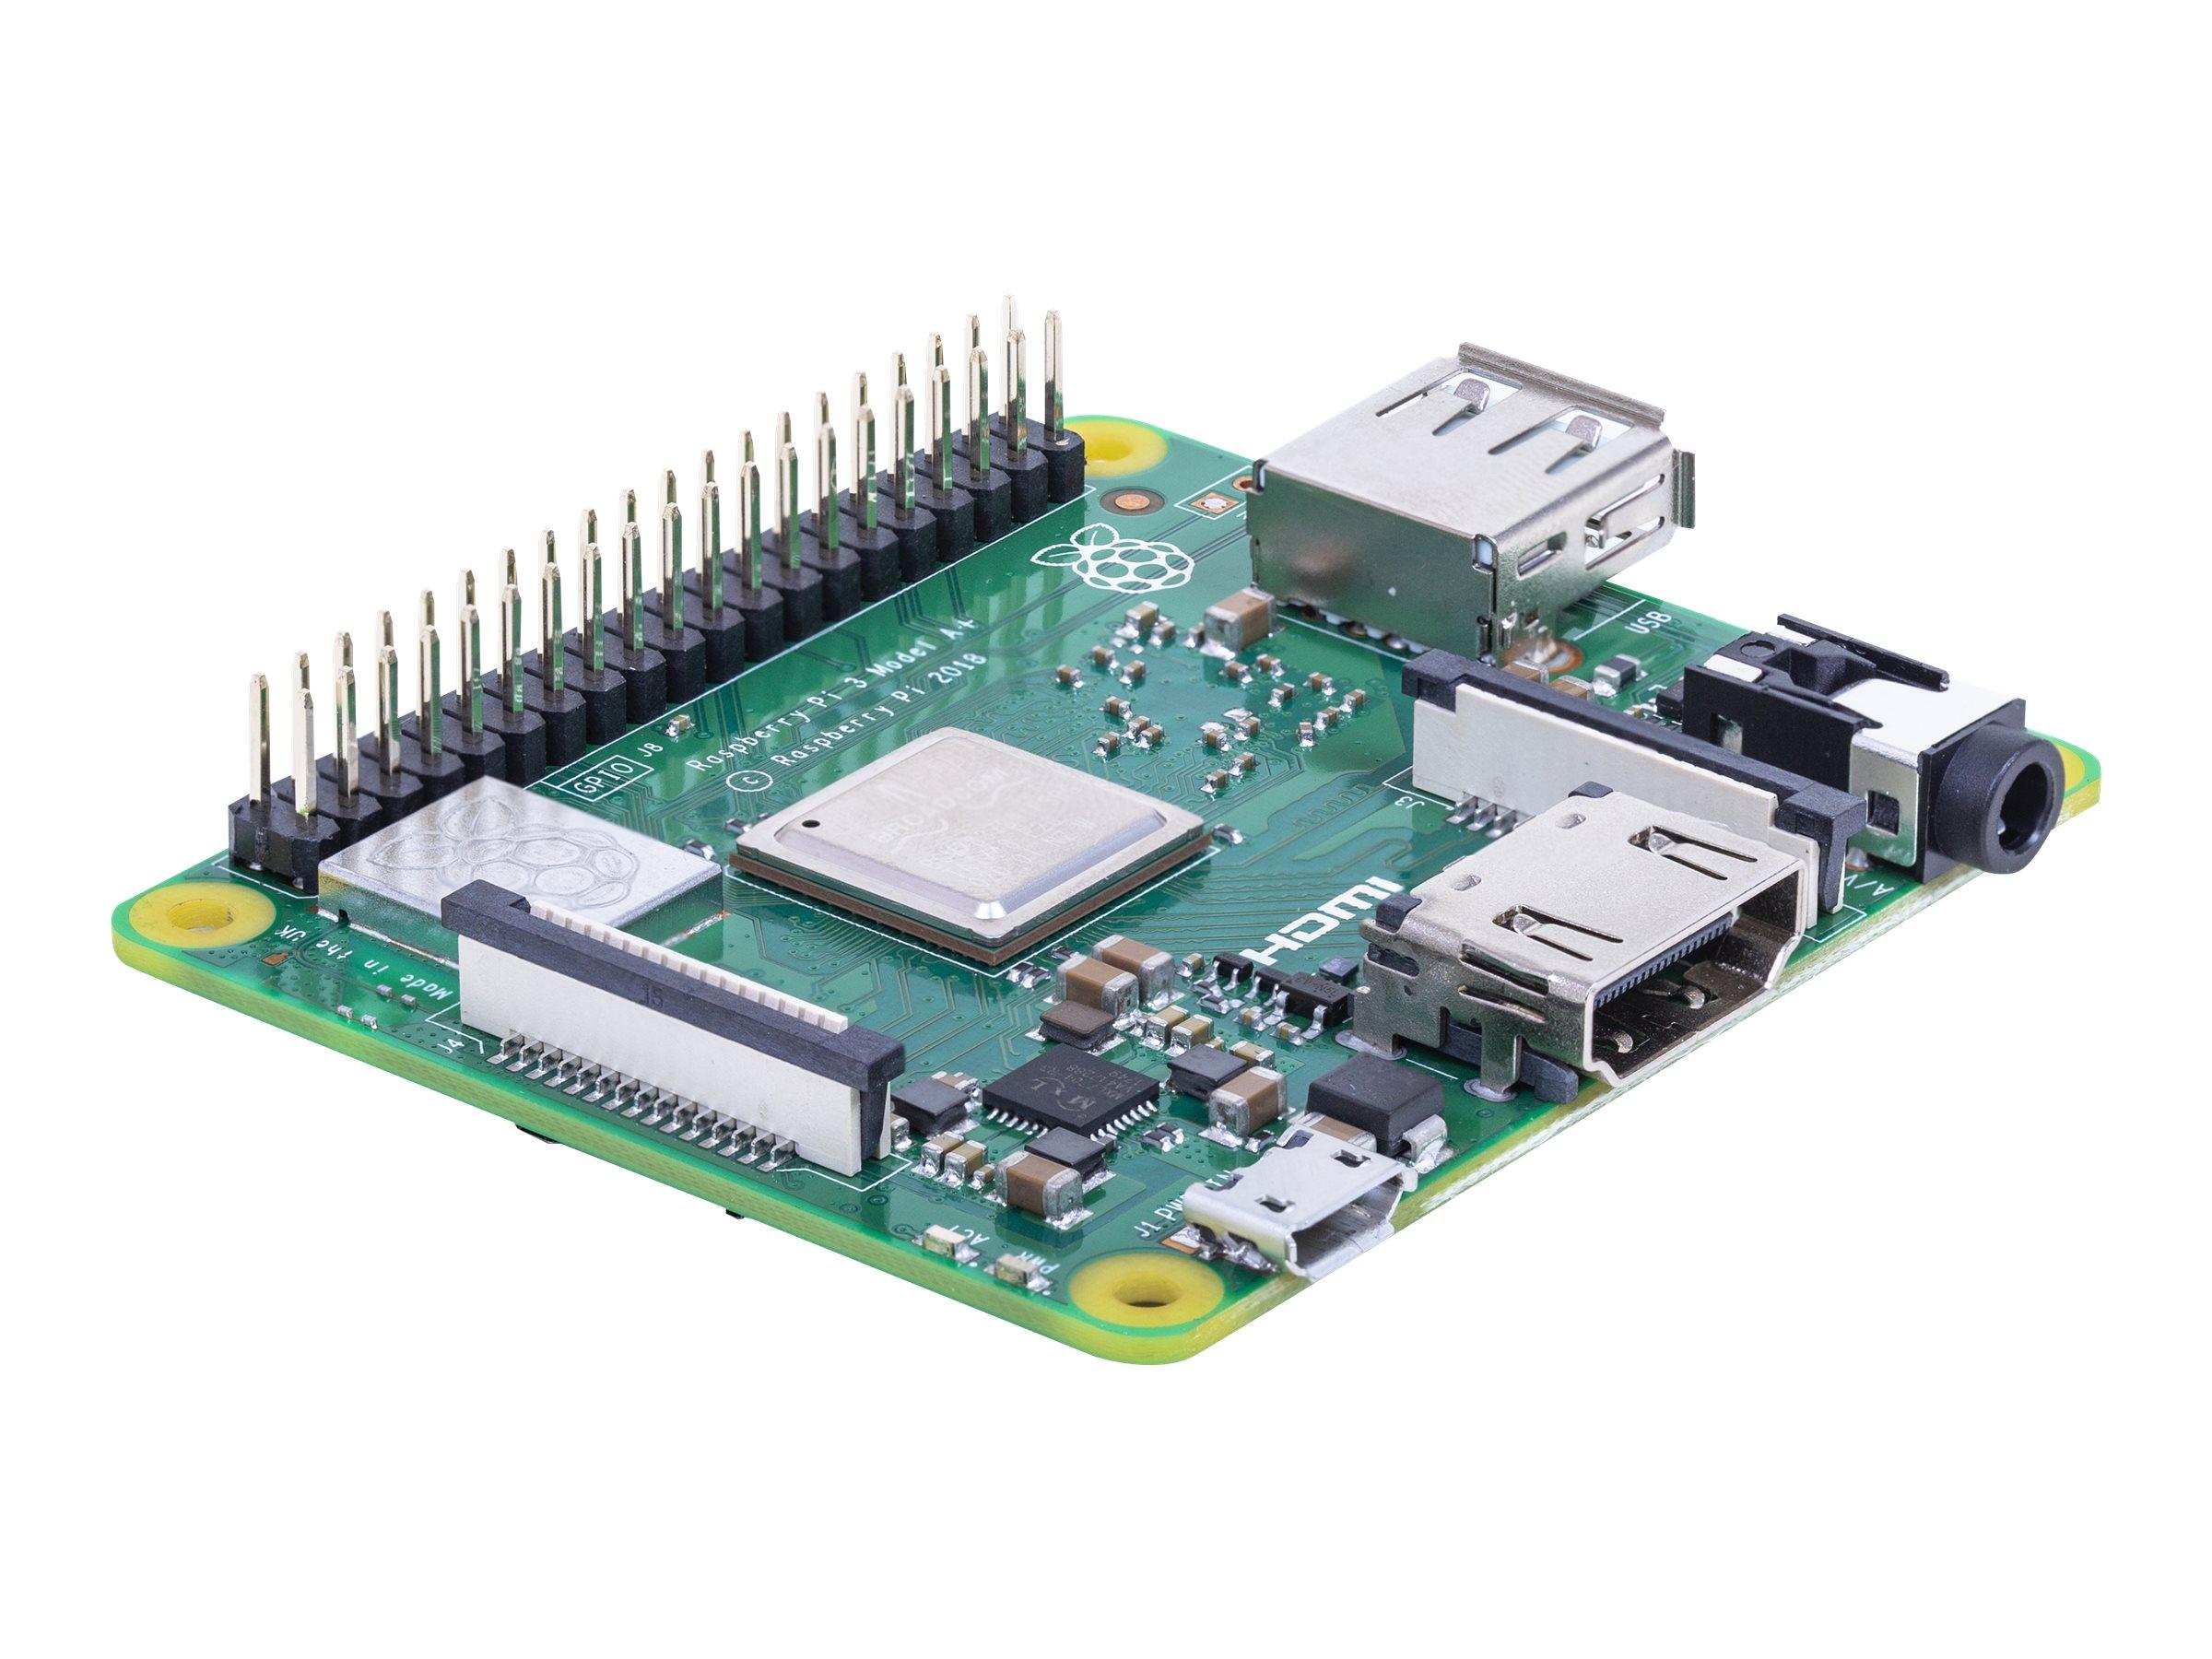 Raspberry Pi 3 Model A+ - Einplatinenrechner - Broadcom BCM2837B0 1.4 GHz - RAM 512 MB - 802.11a/b/g/n/ac, Bluetooth 4.2